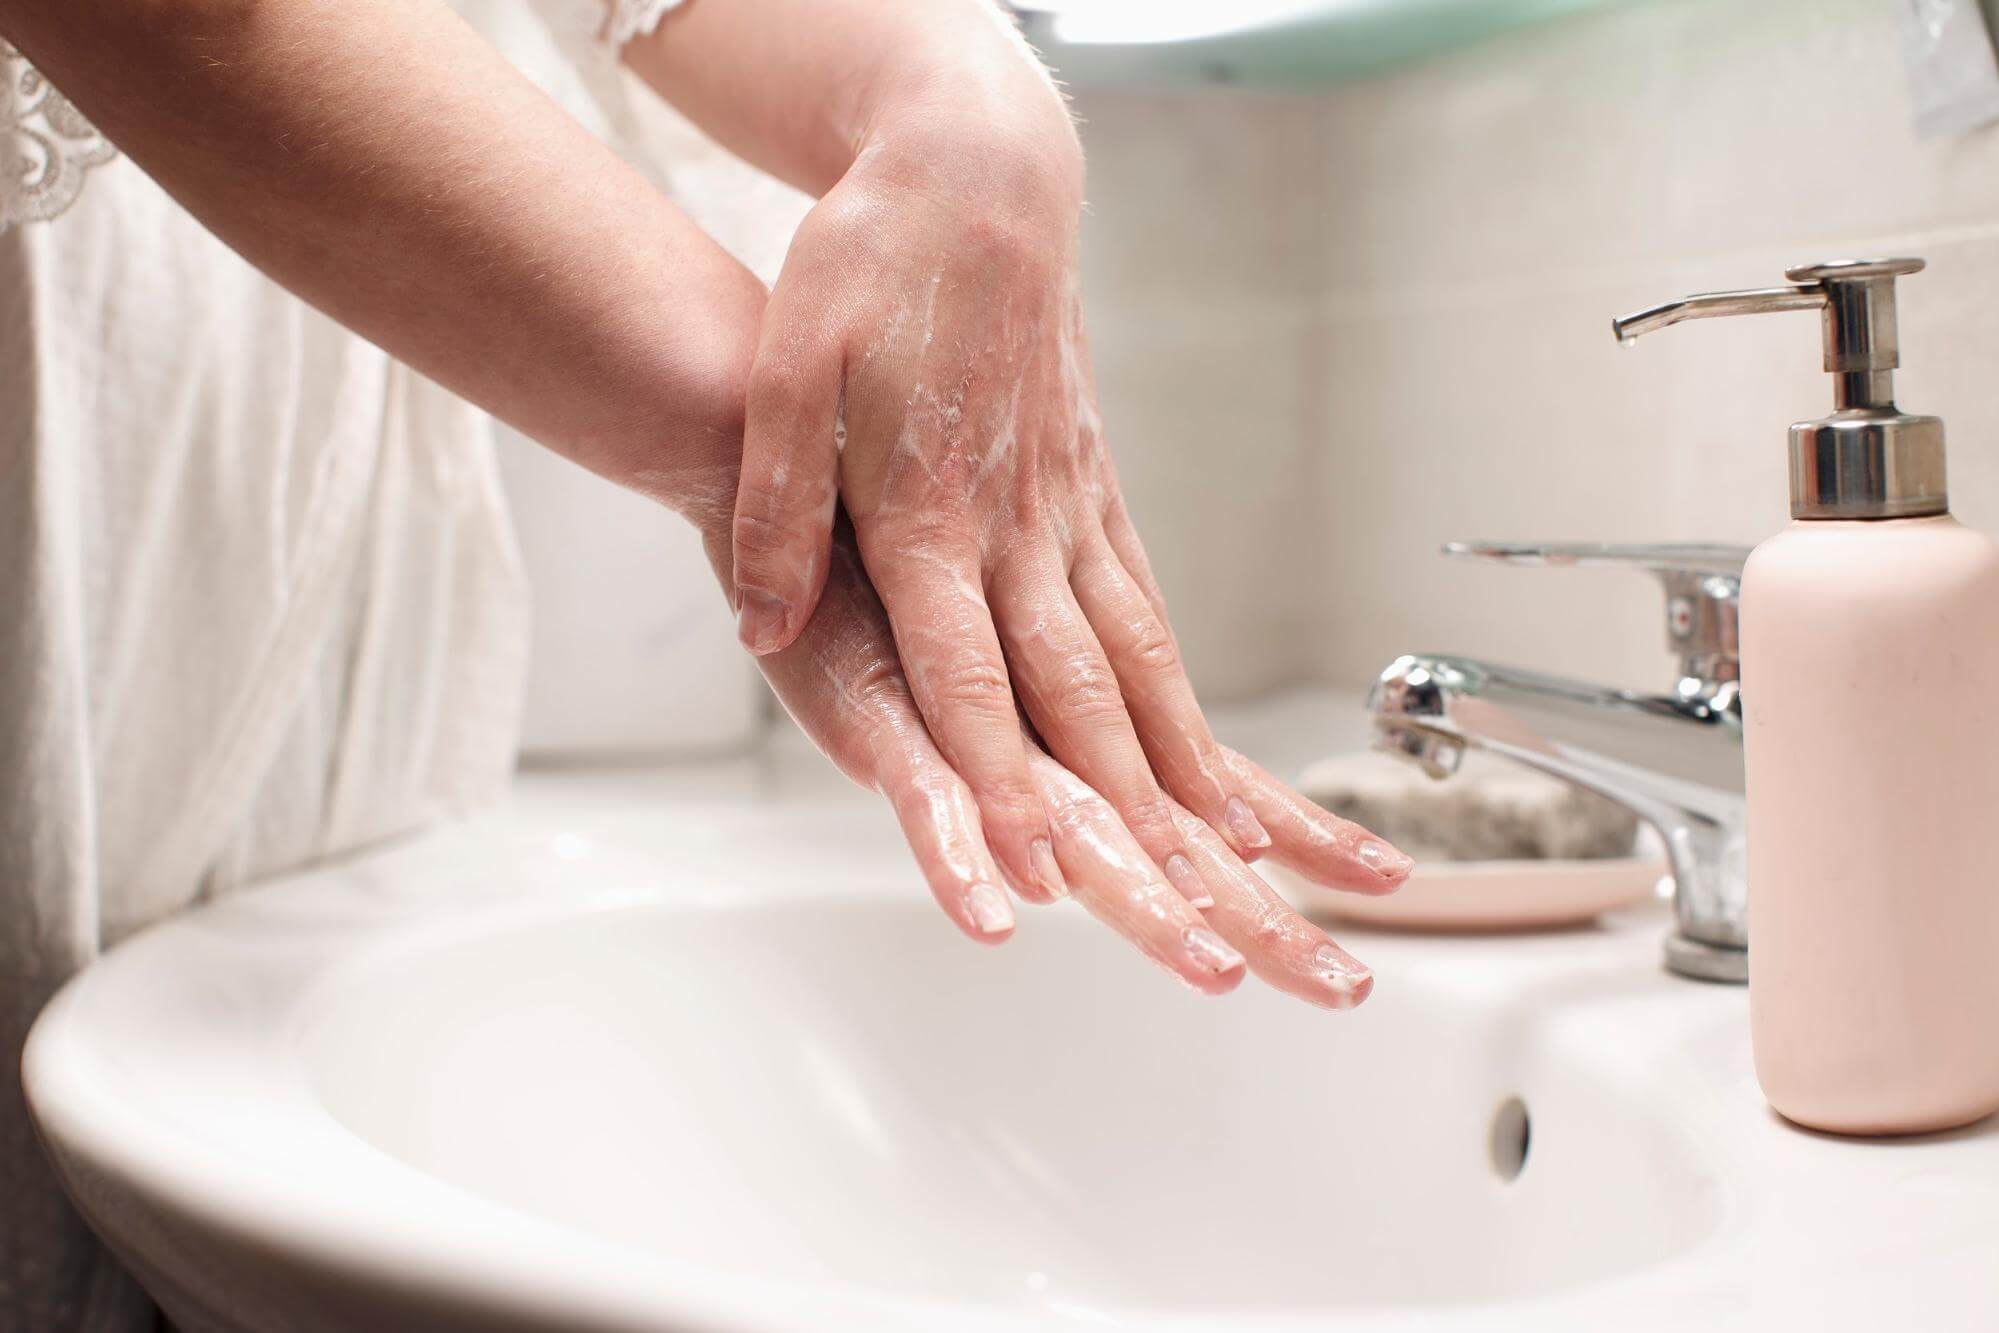 higienizacao das maos lavar diferenca